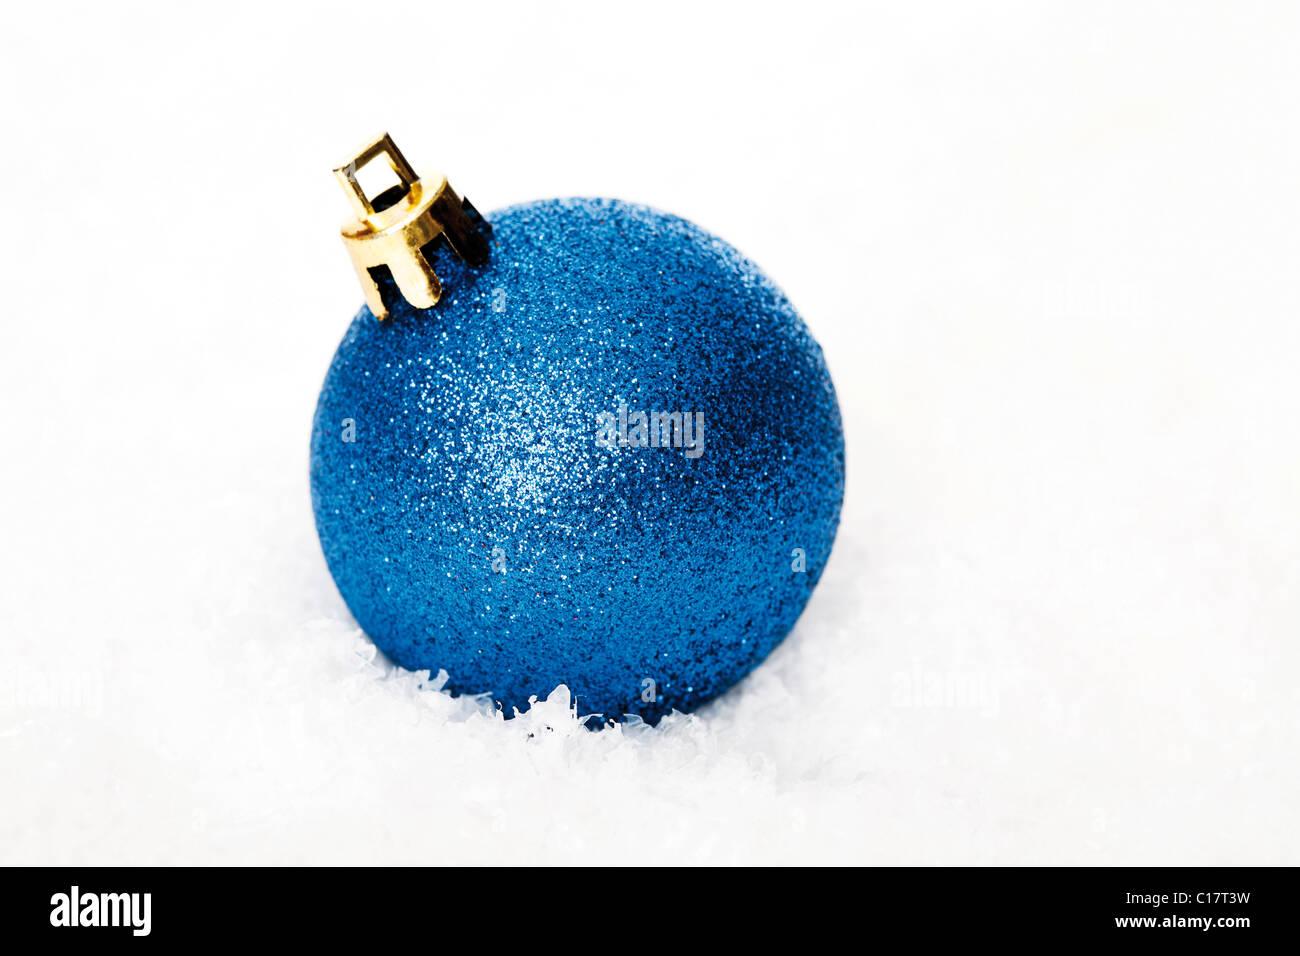 Einzelne Christbaumkugeln.Blue Christmas Tree Ball In Snow Stock Photo 35207981 Alamy